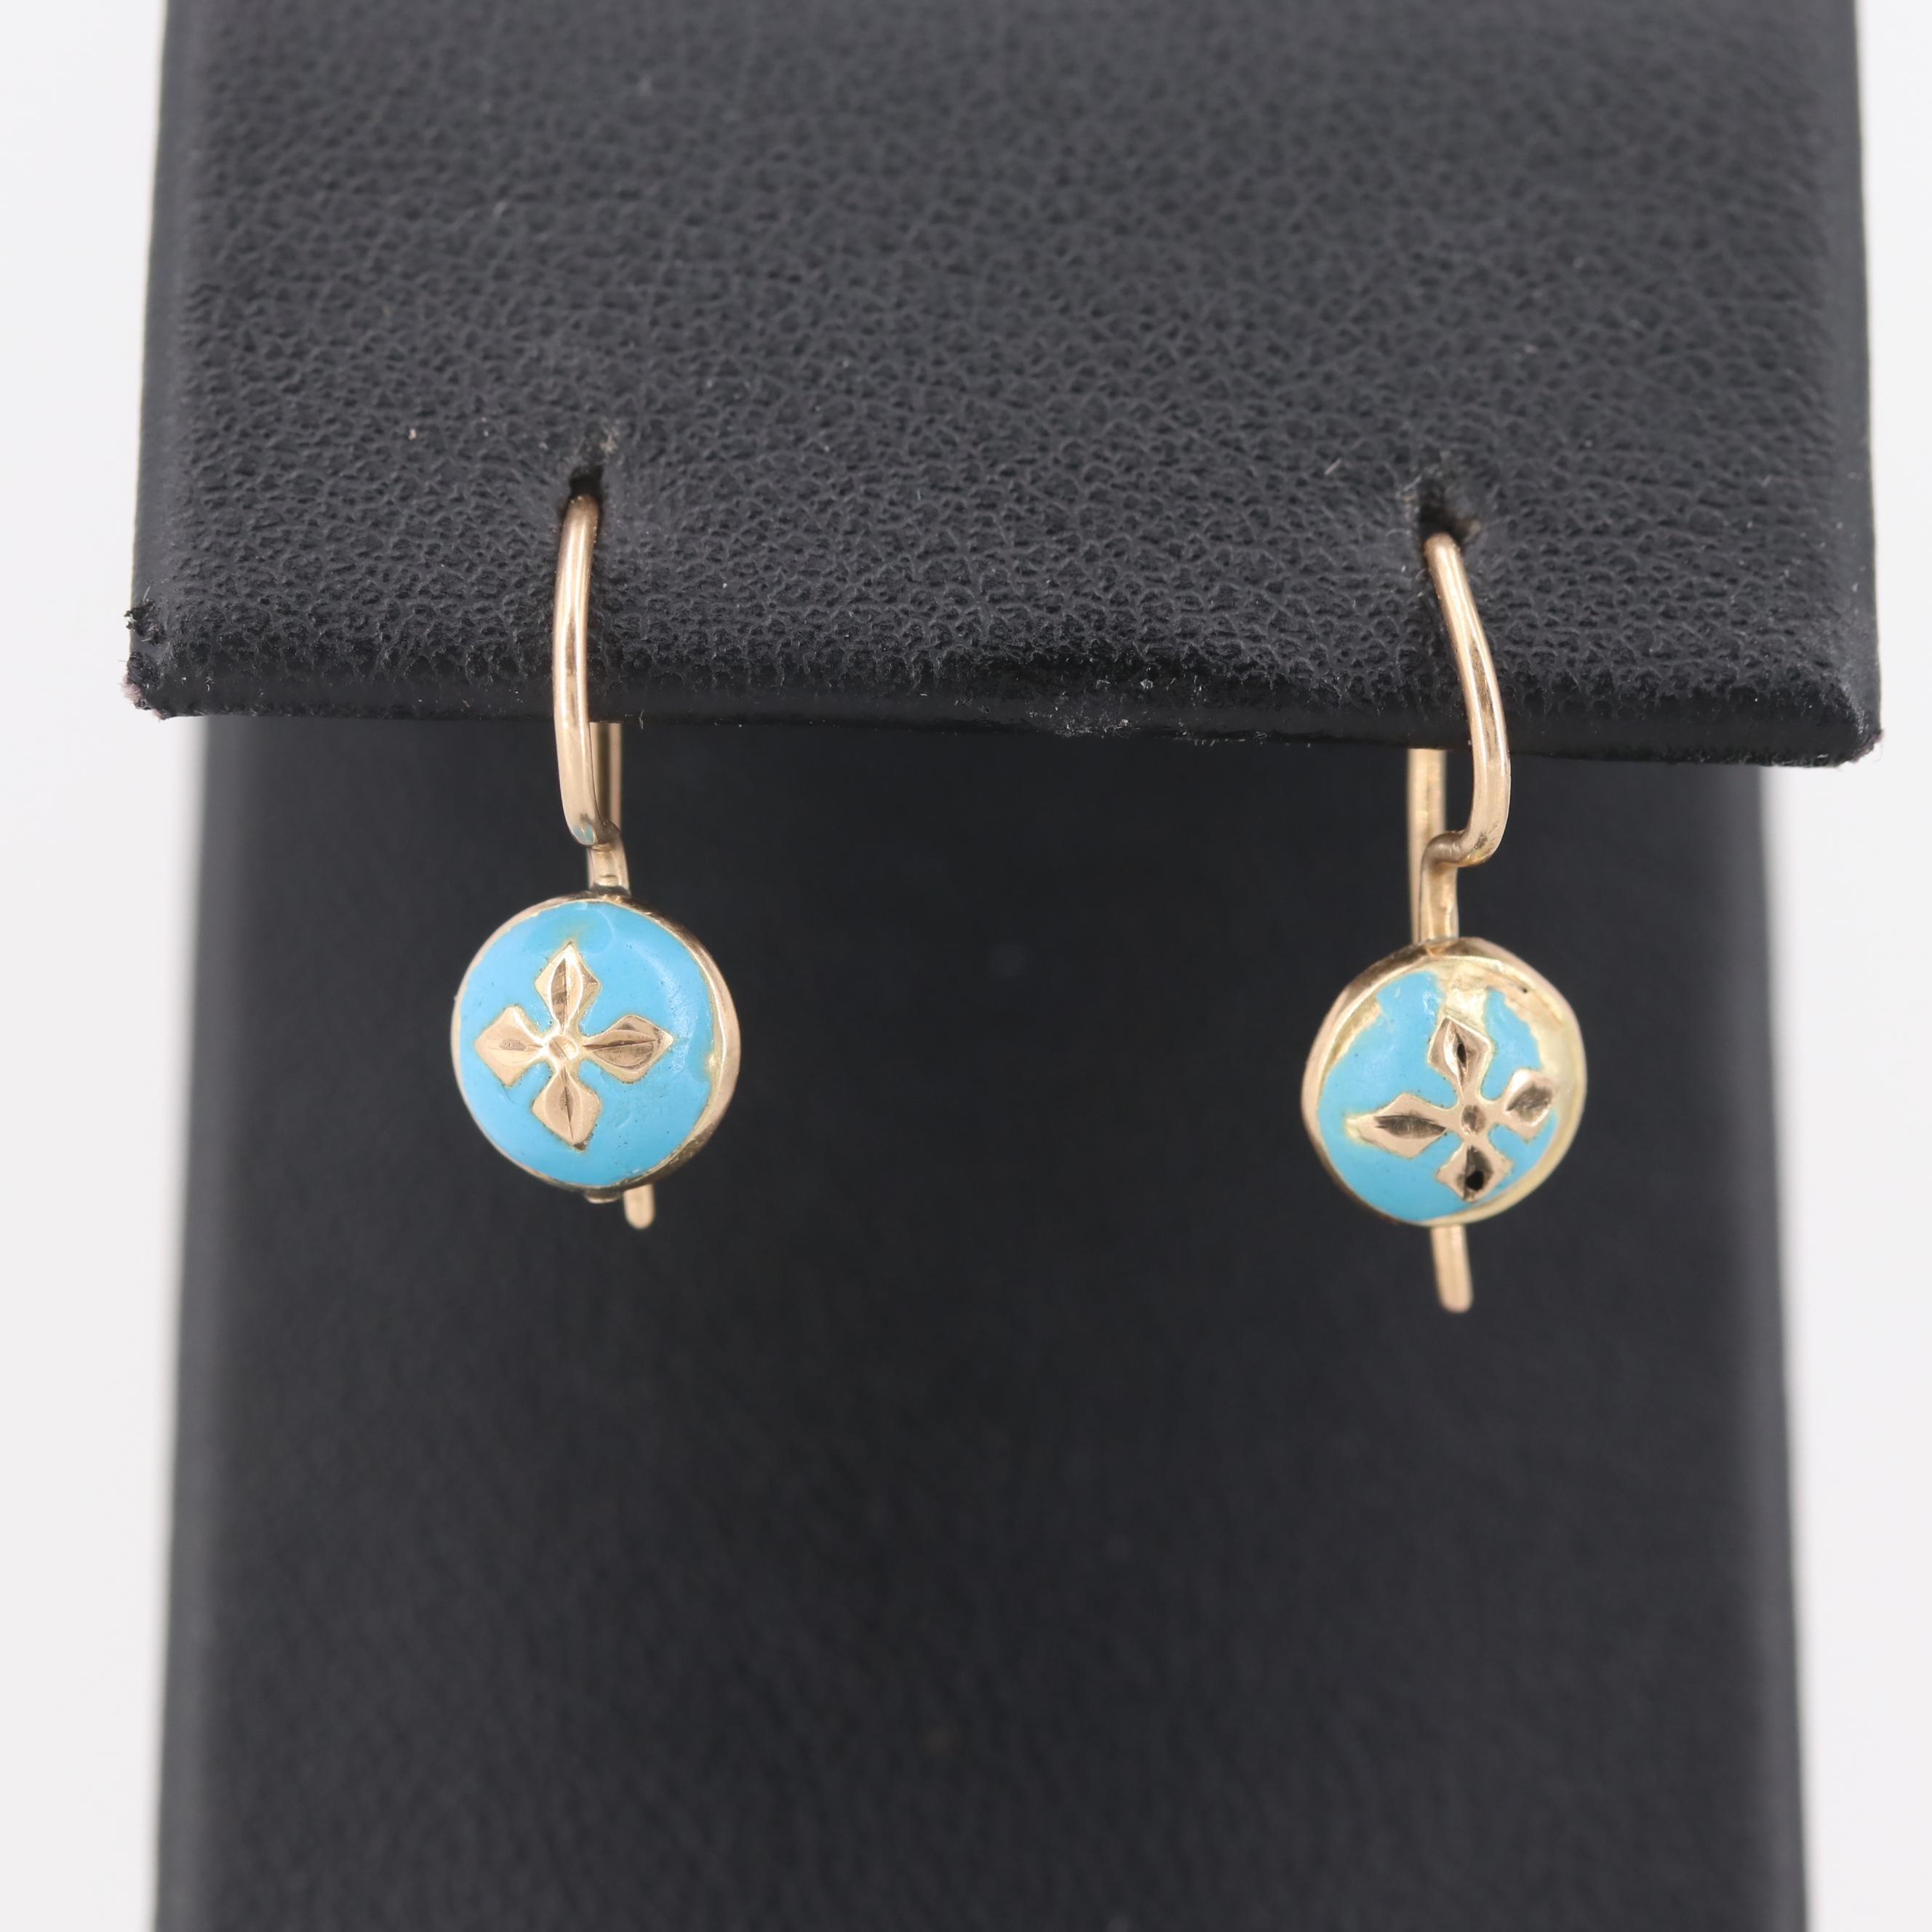 Circa 1910 14K Yellow Gold Enamel Drop Earrings